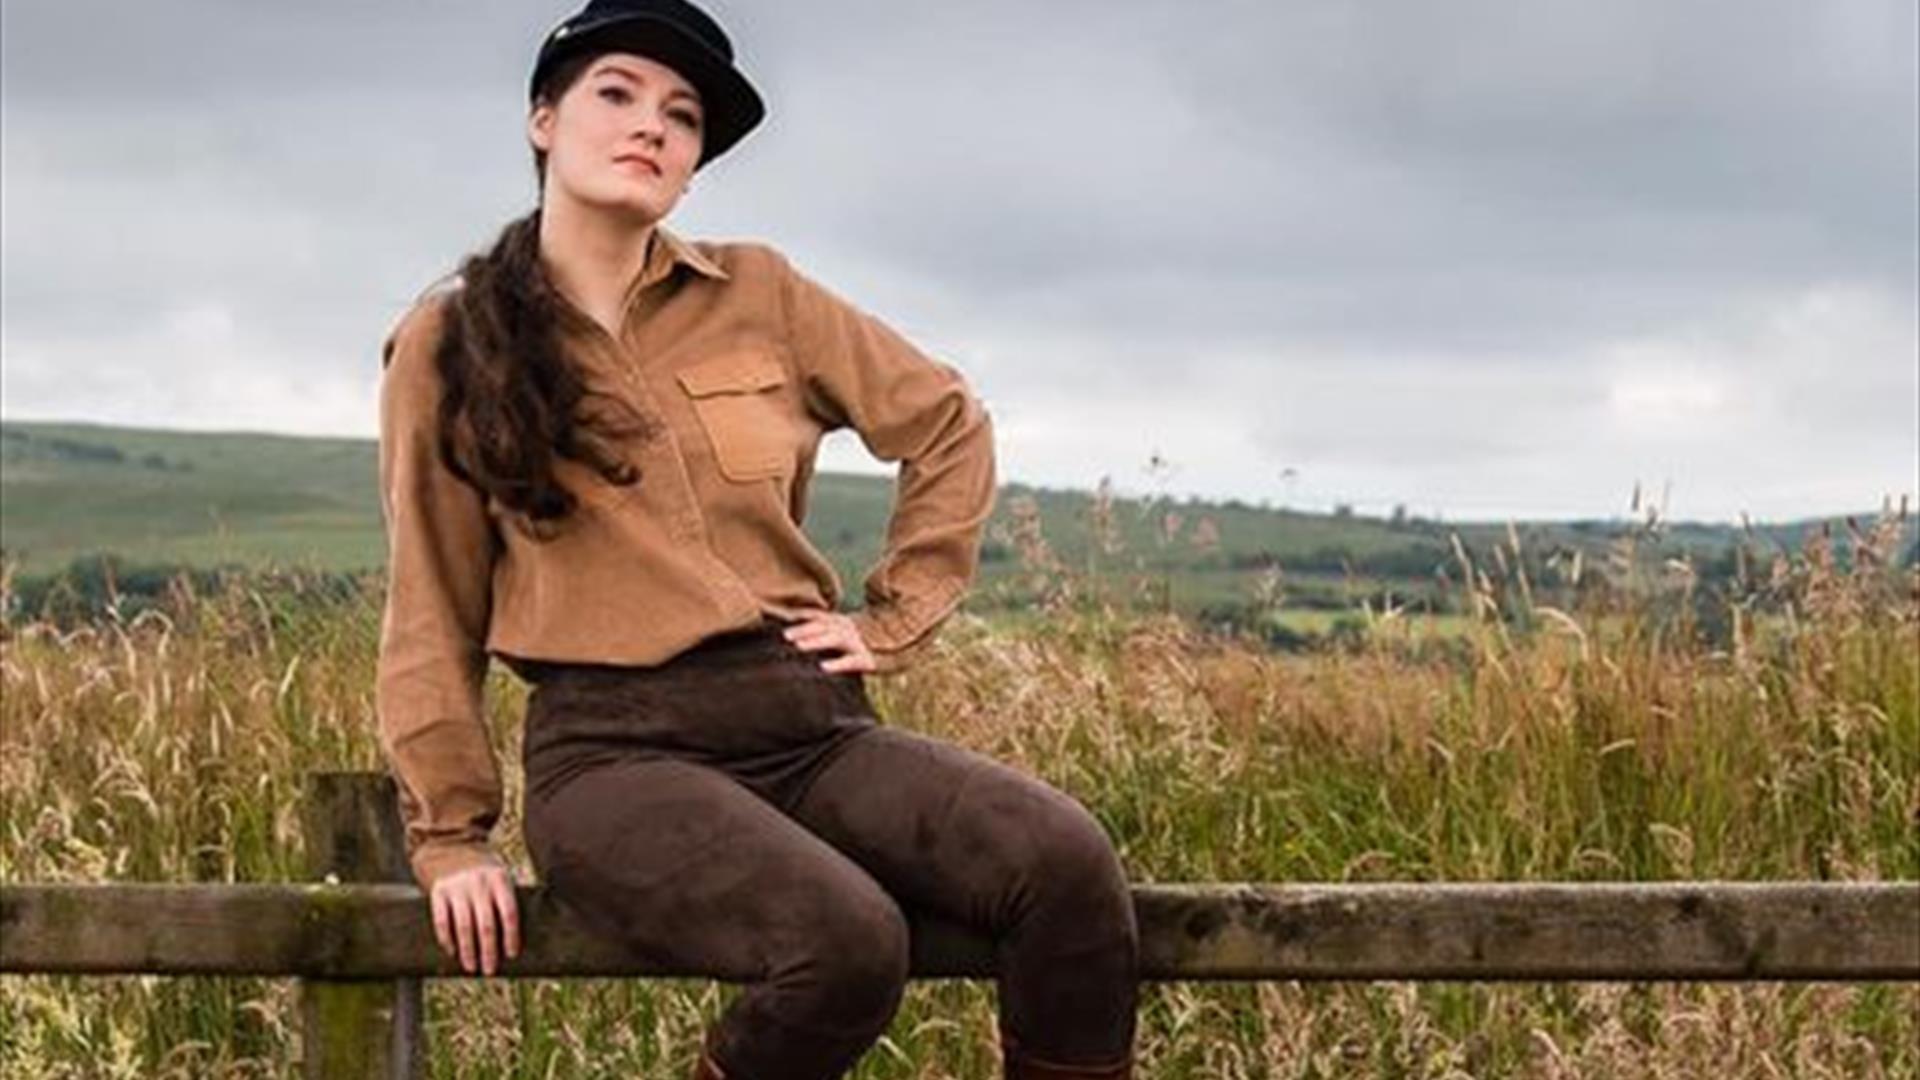 Sophie Williams as Calamity Jane